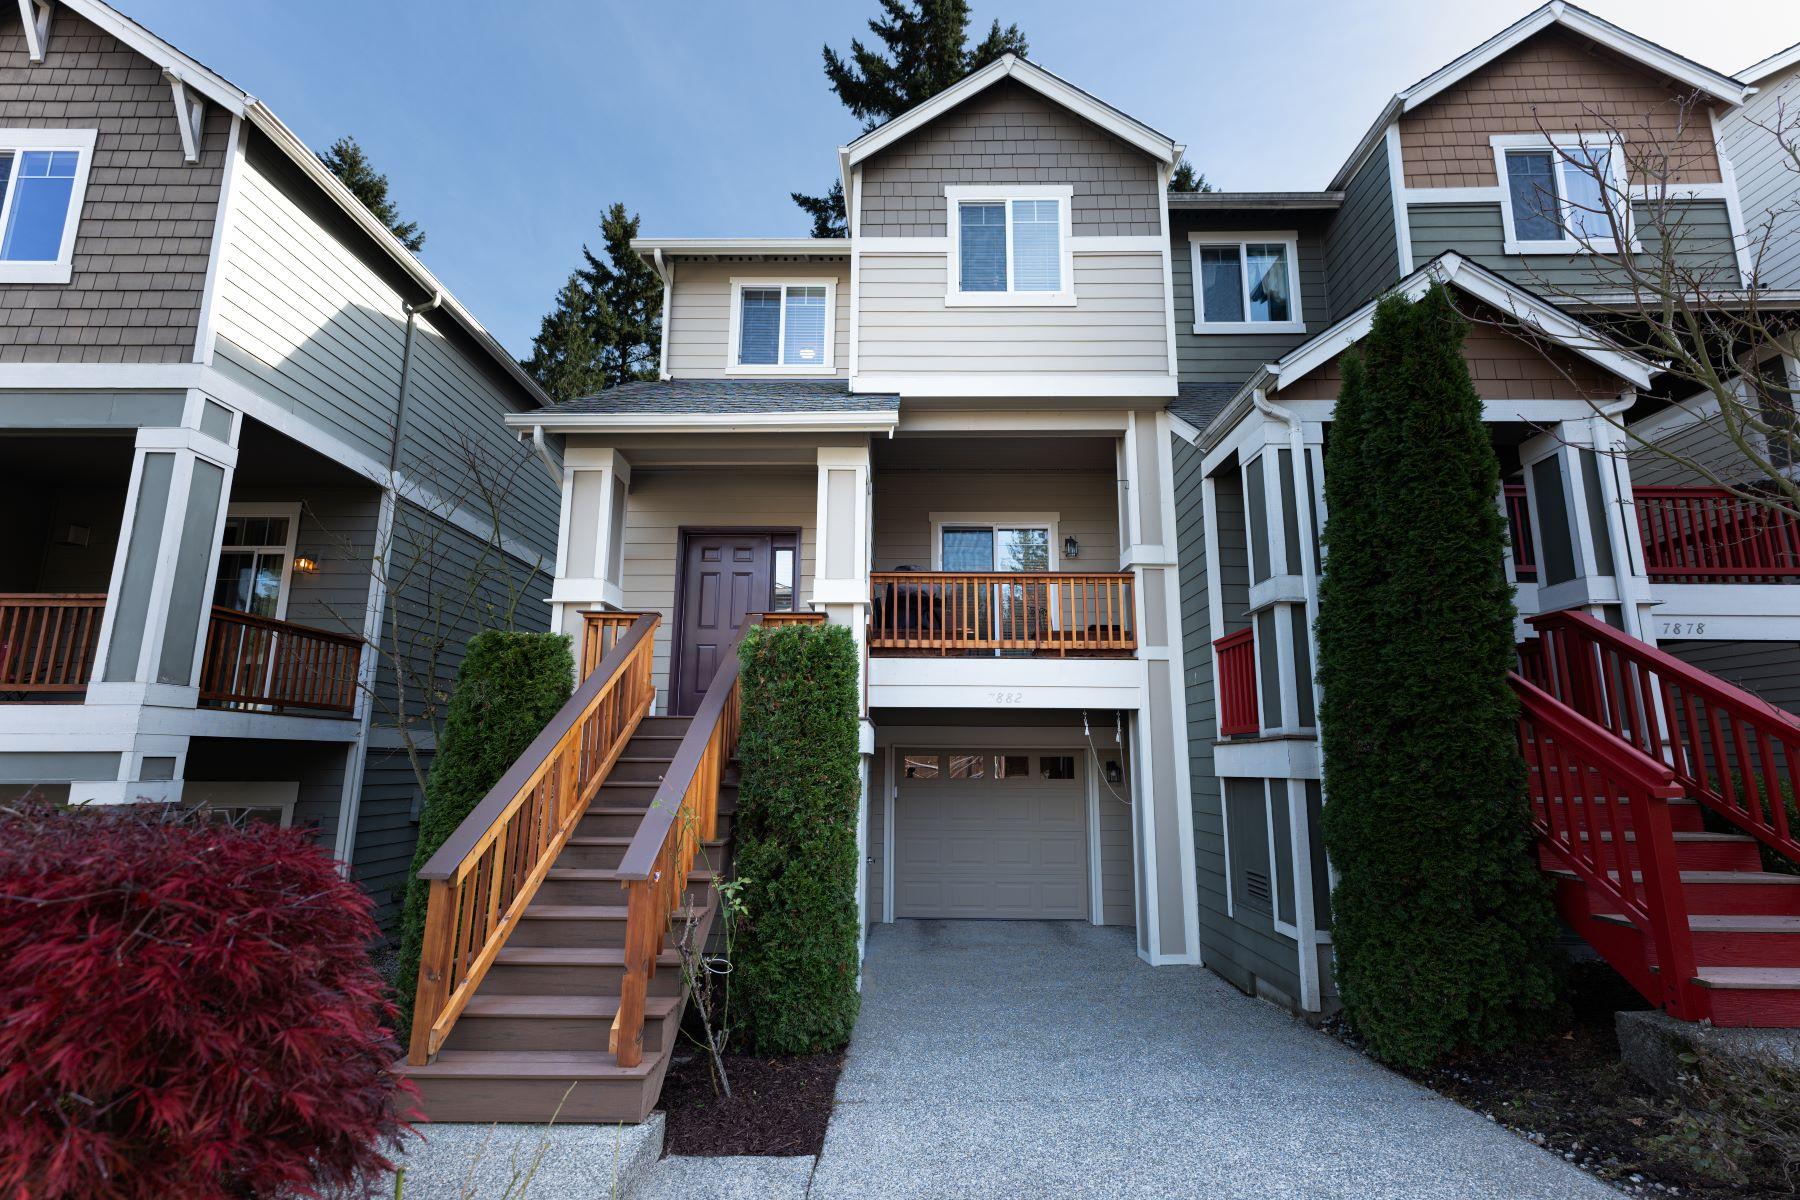 Single Family Homes for Sale at 7882 148th Ct NE, Redmond, WA 98052 7882 148th Ct NE Redmond, Washington 98052 United States